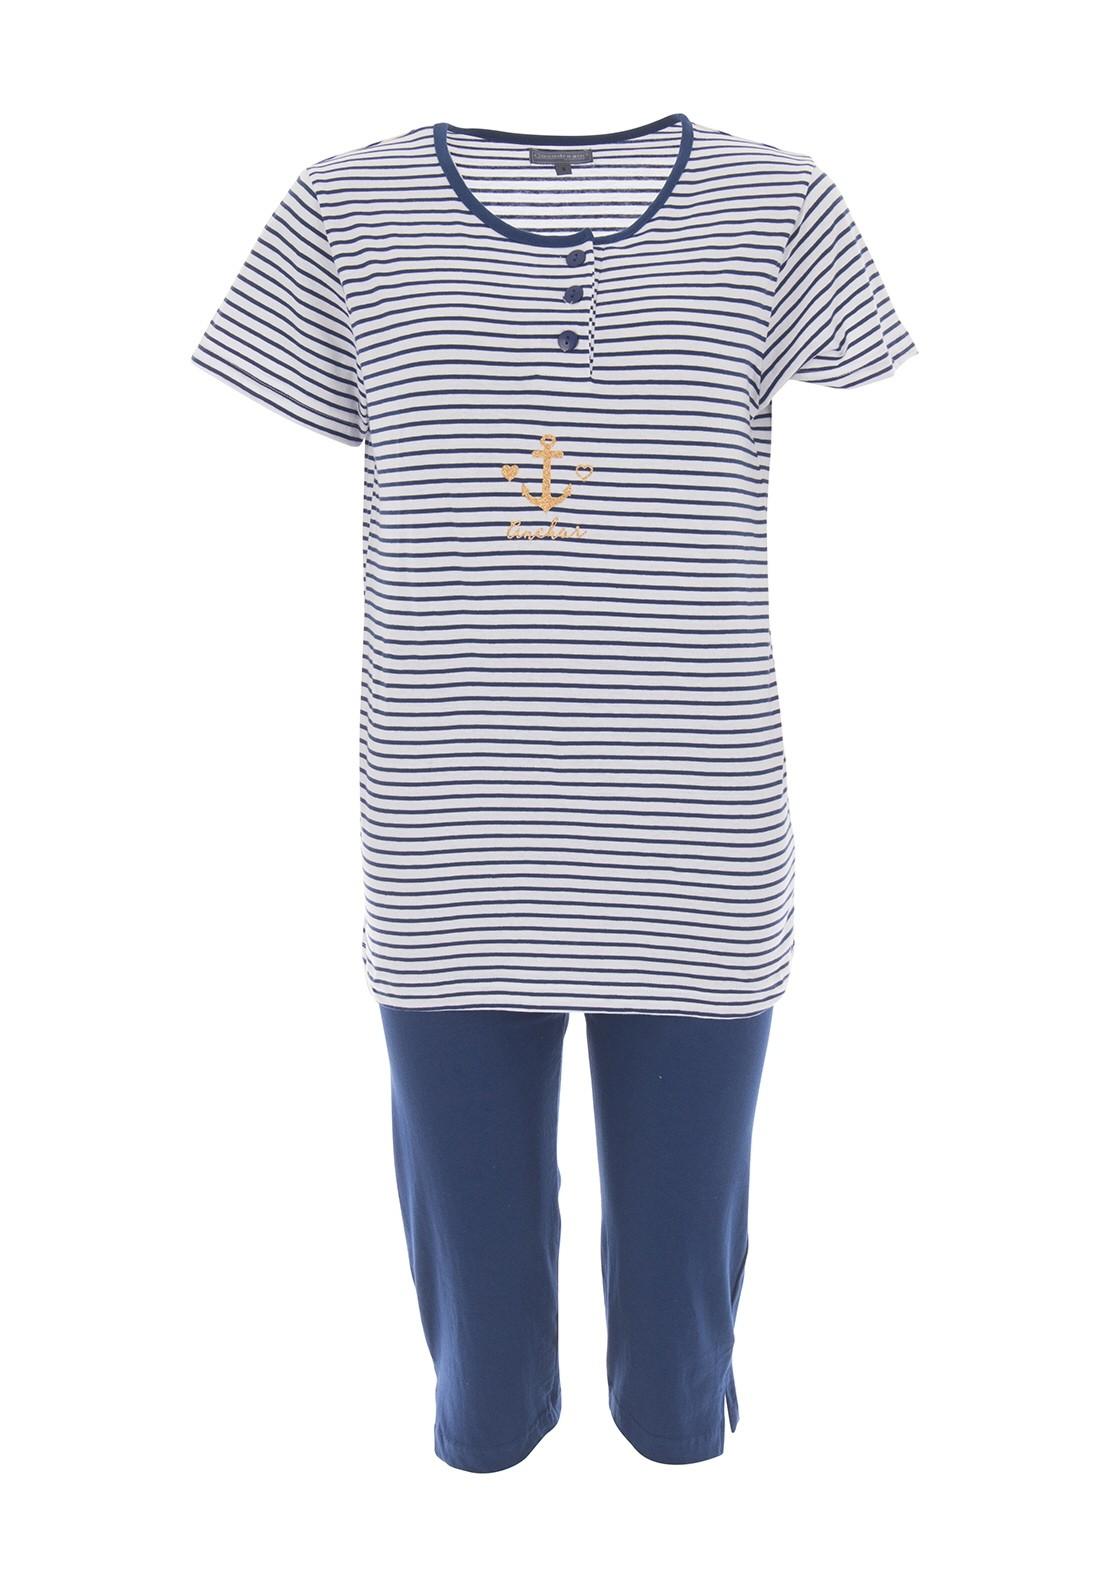 Pyjama garcon soldes